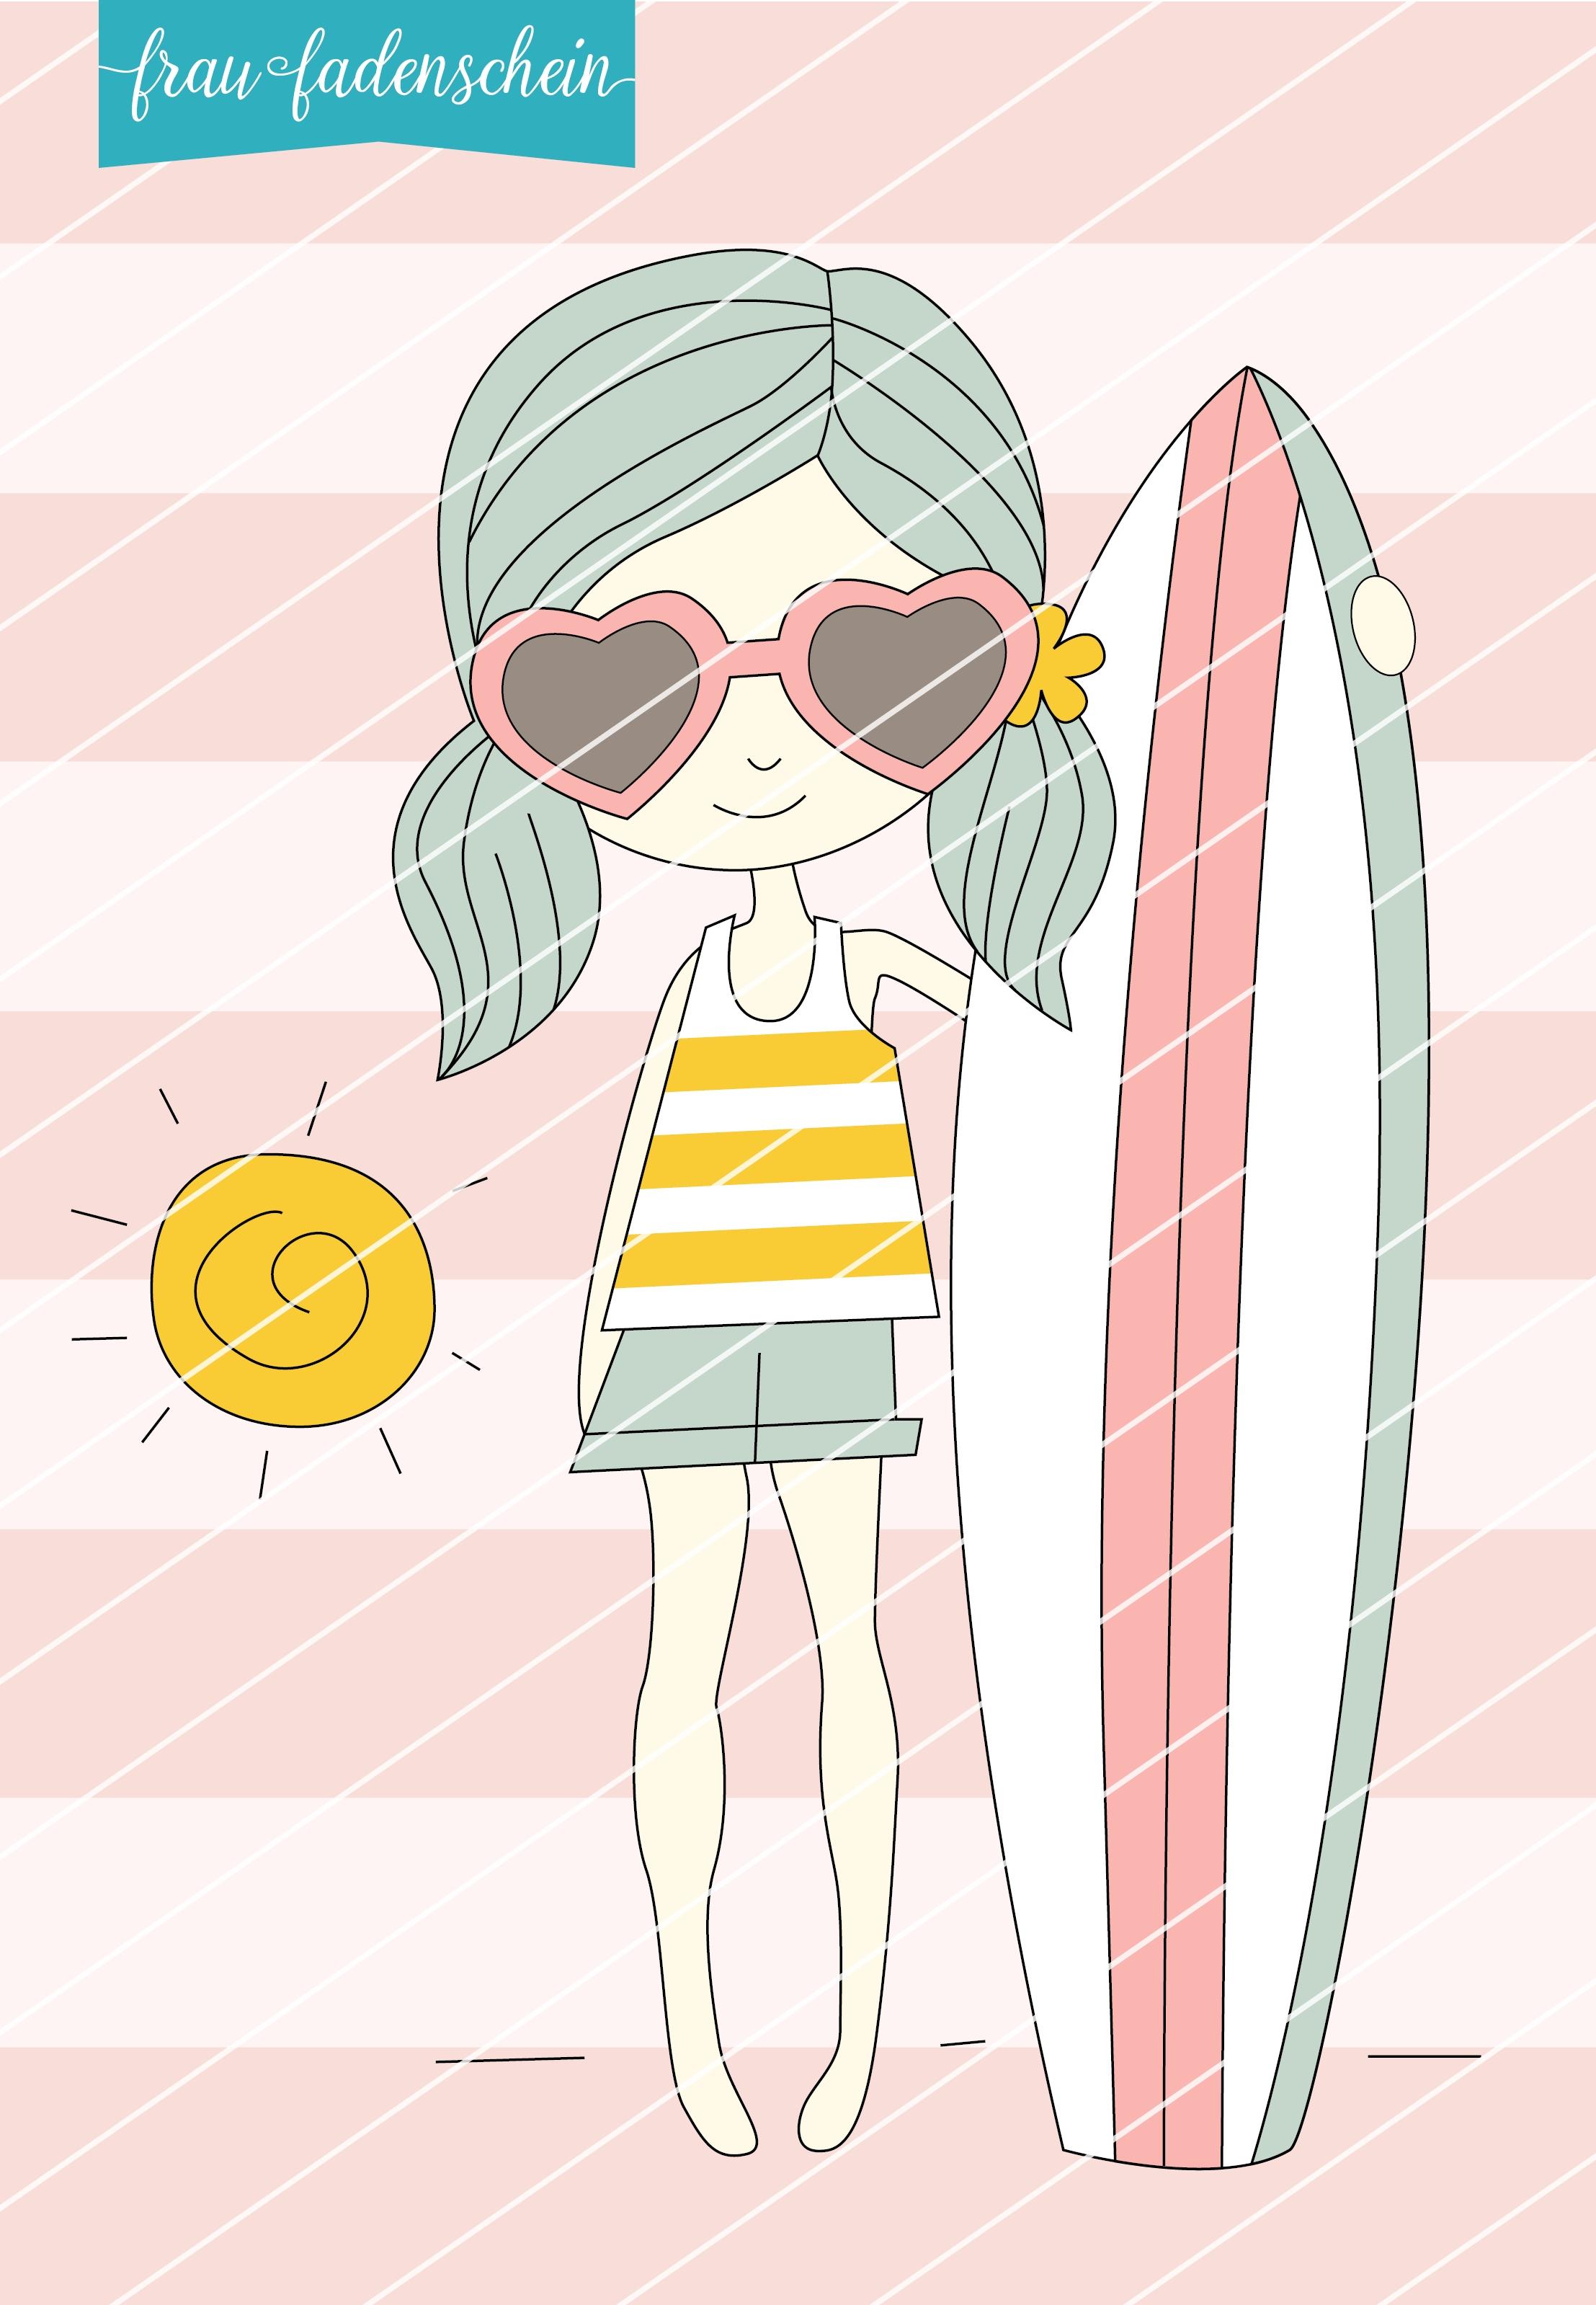 applikationsvorlage-mimi-goes-surfing